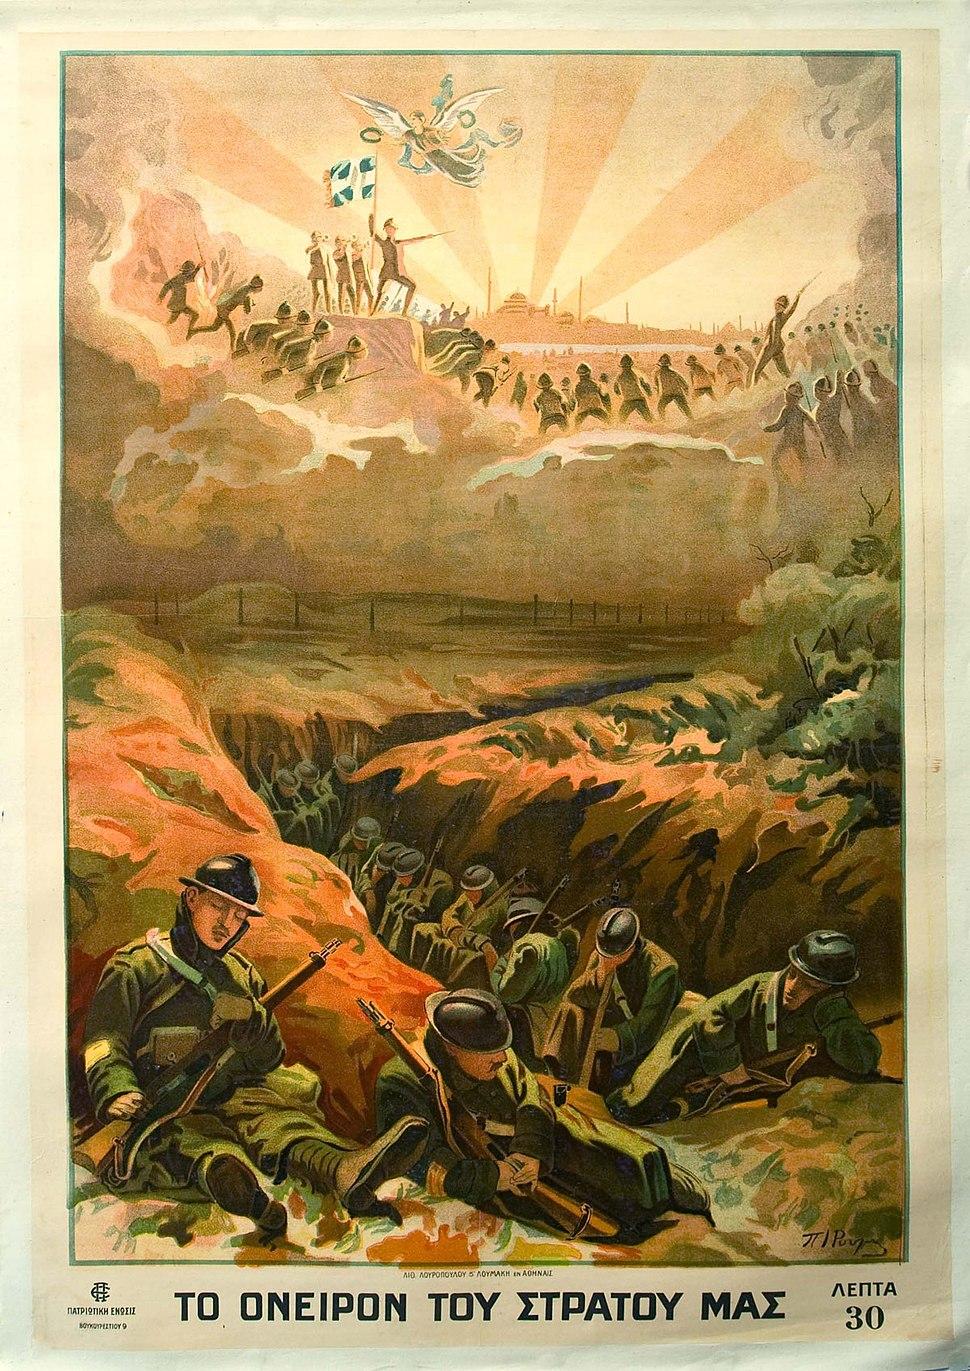 Greece-1917-war-poster-02-petros roumbos-56x83cm